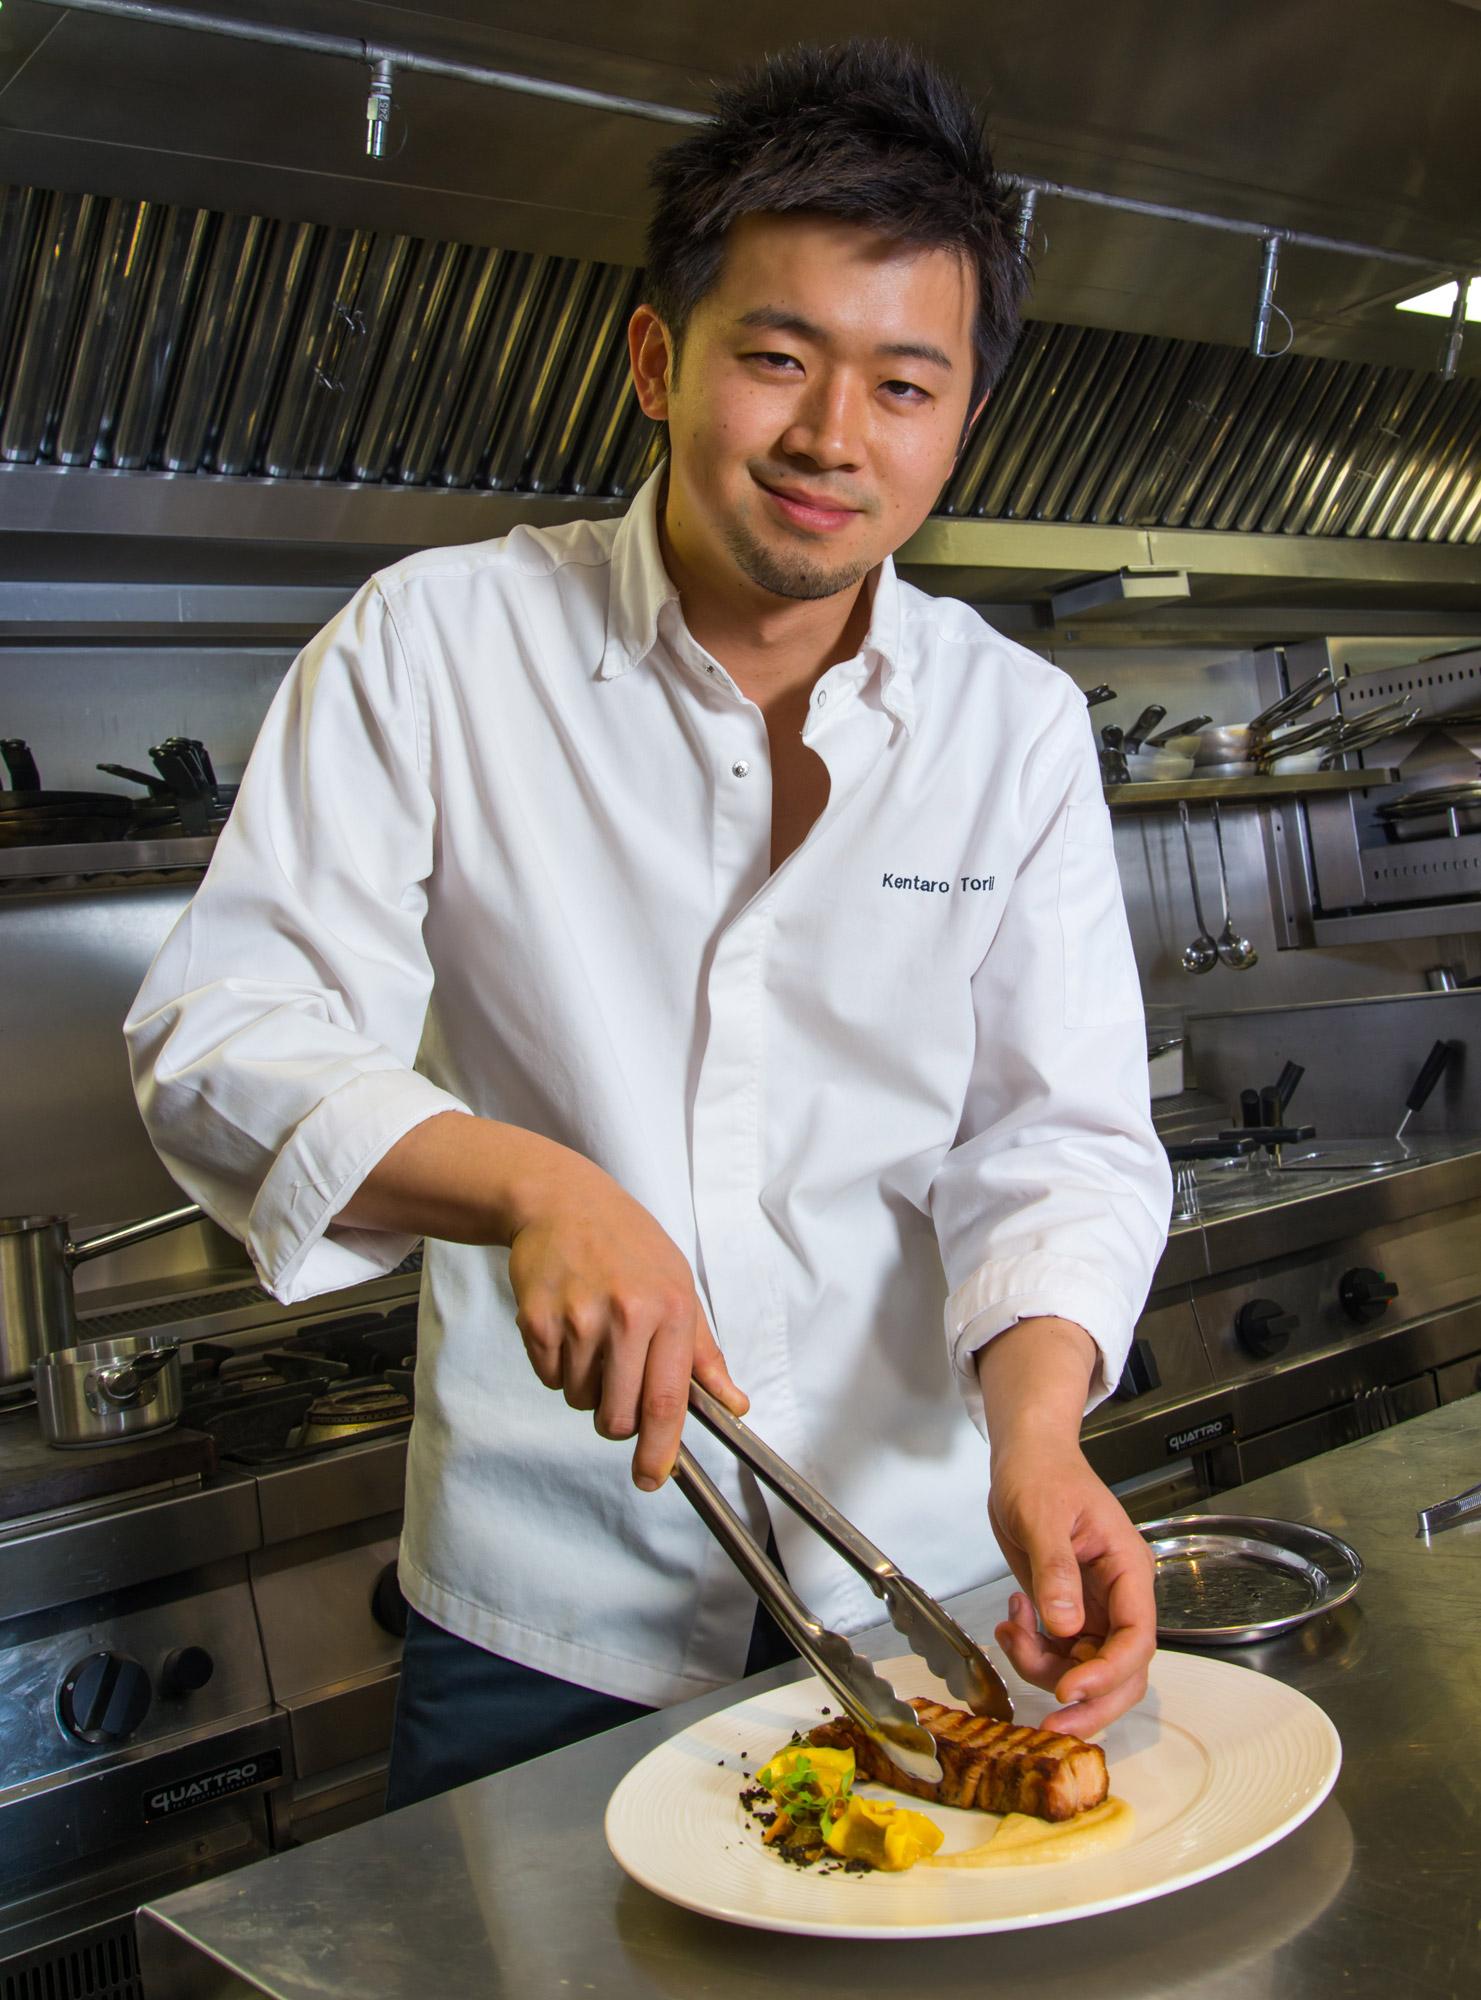 Kentaro Torii, Executive Chef at Bella Cosa